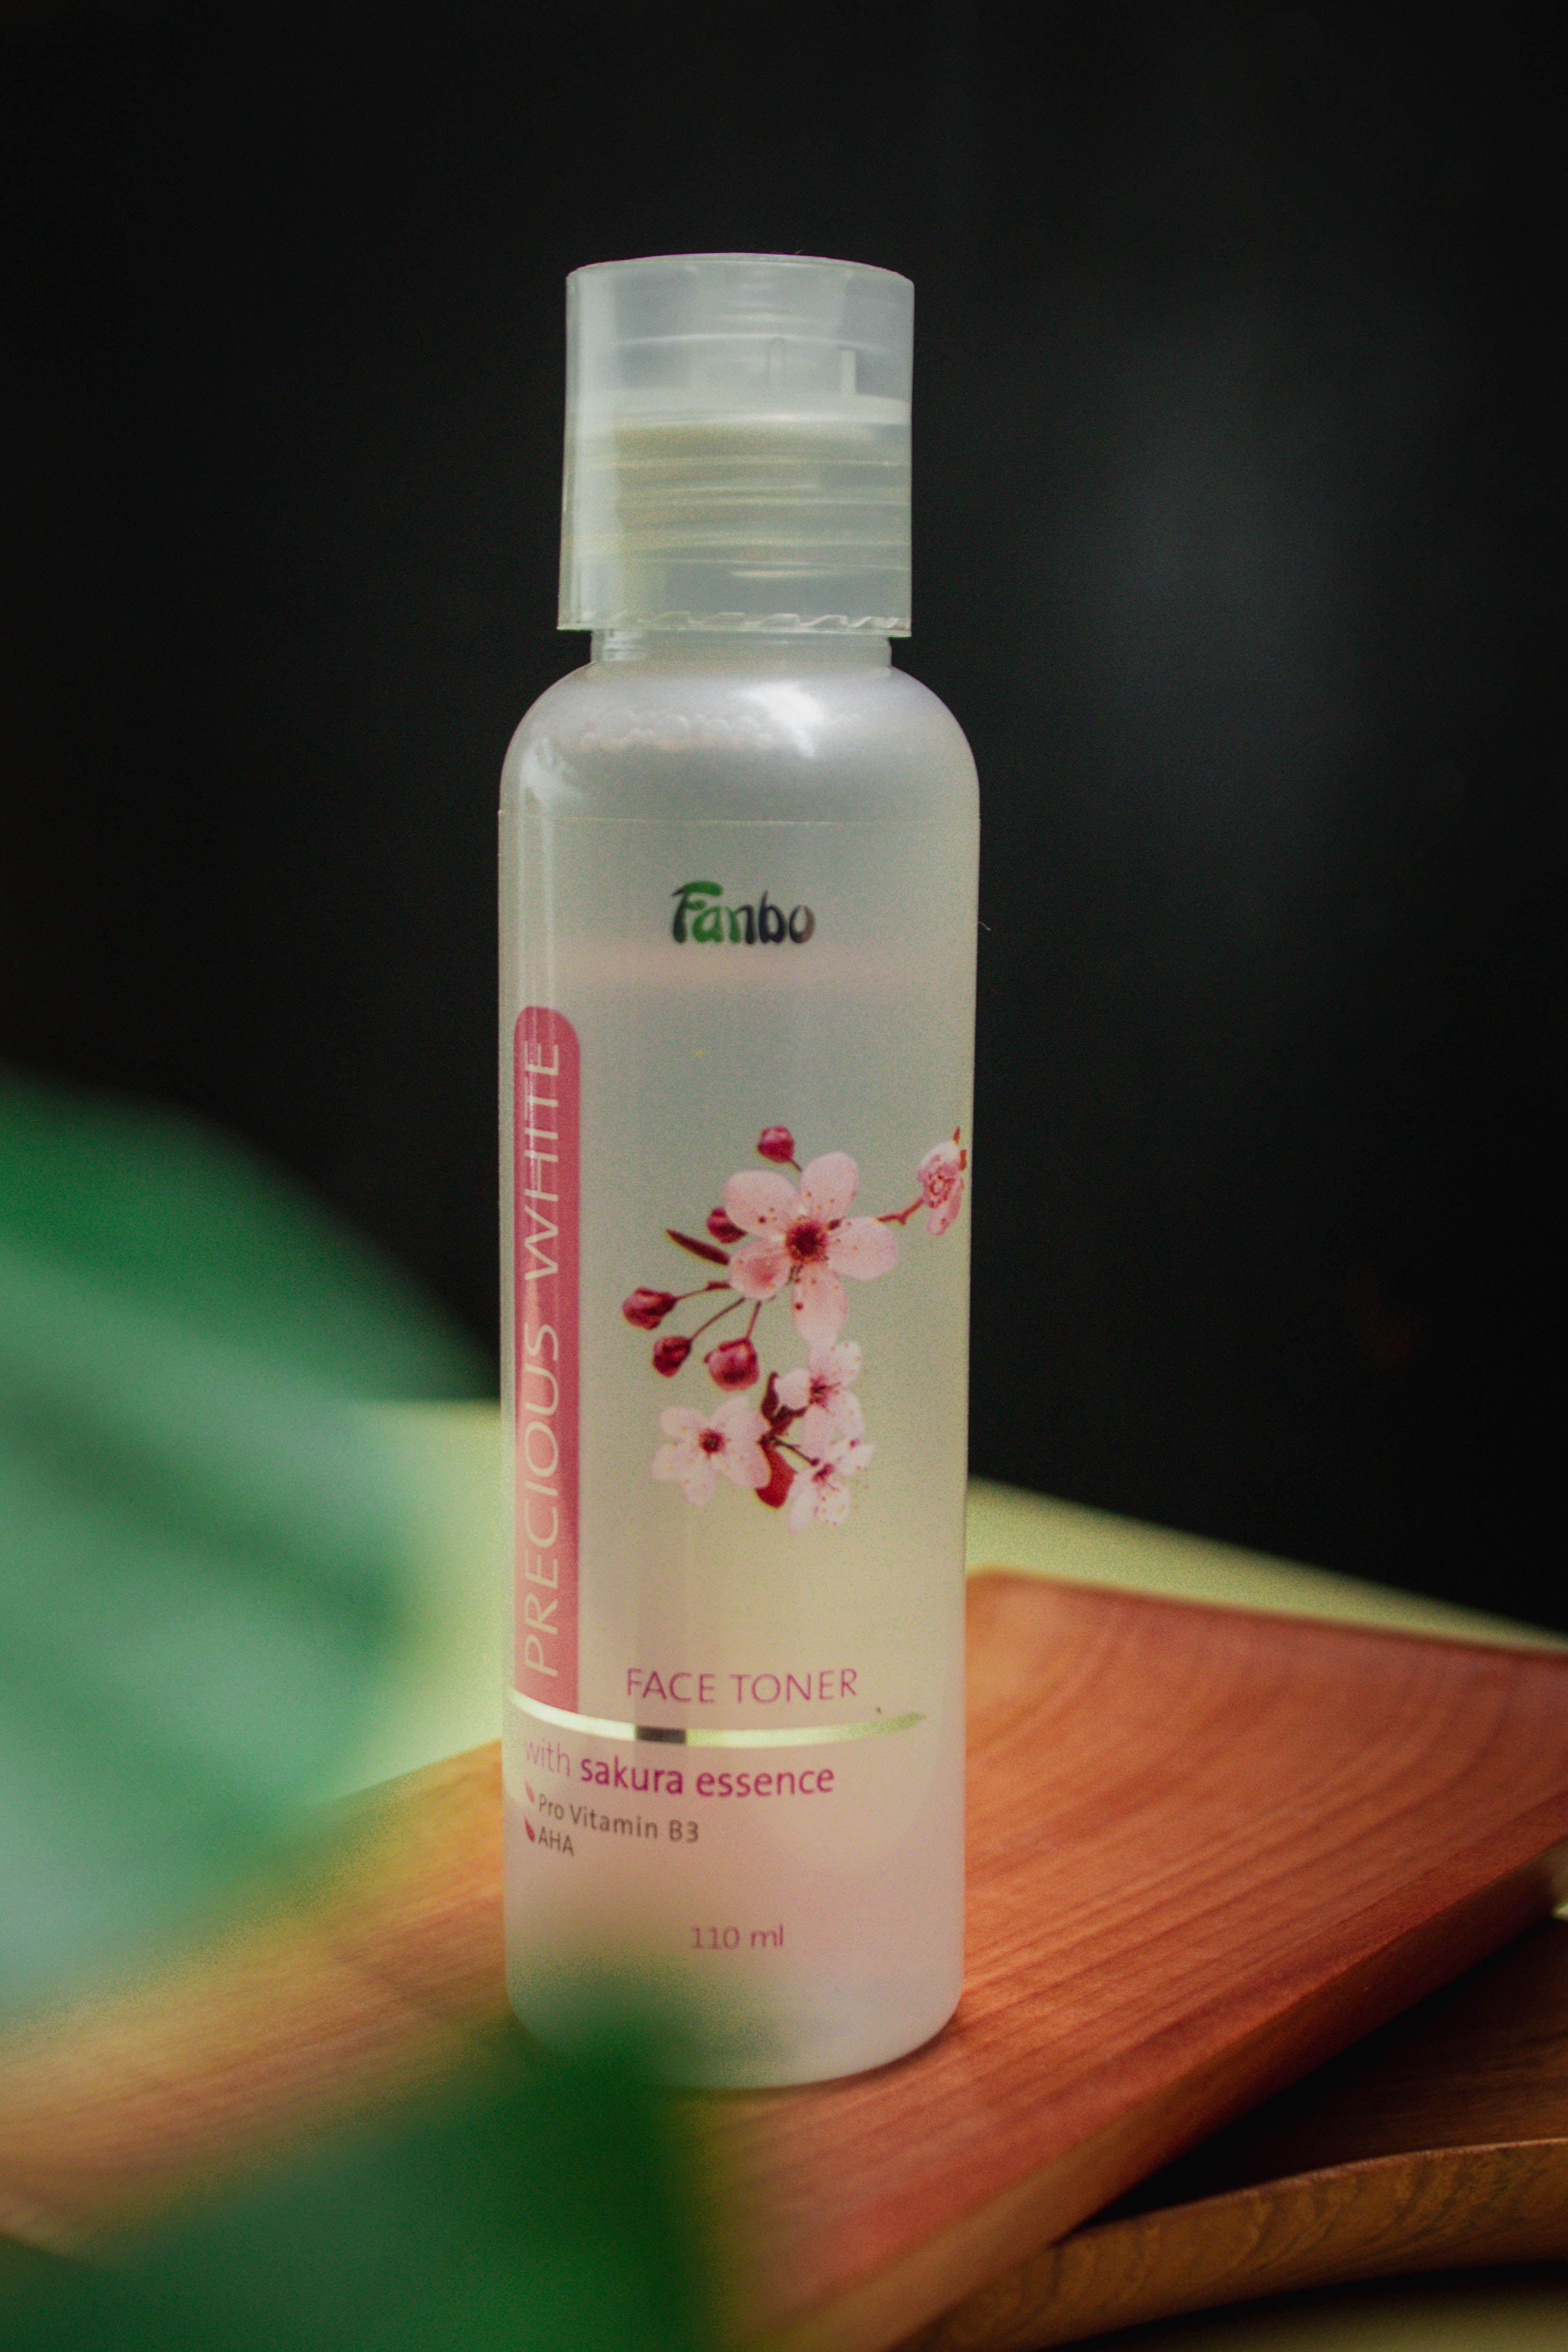 image review Fanbo Precious White Face Toner